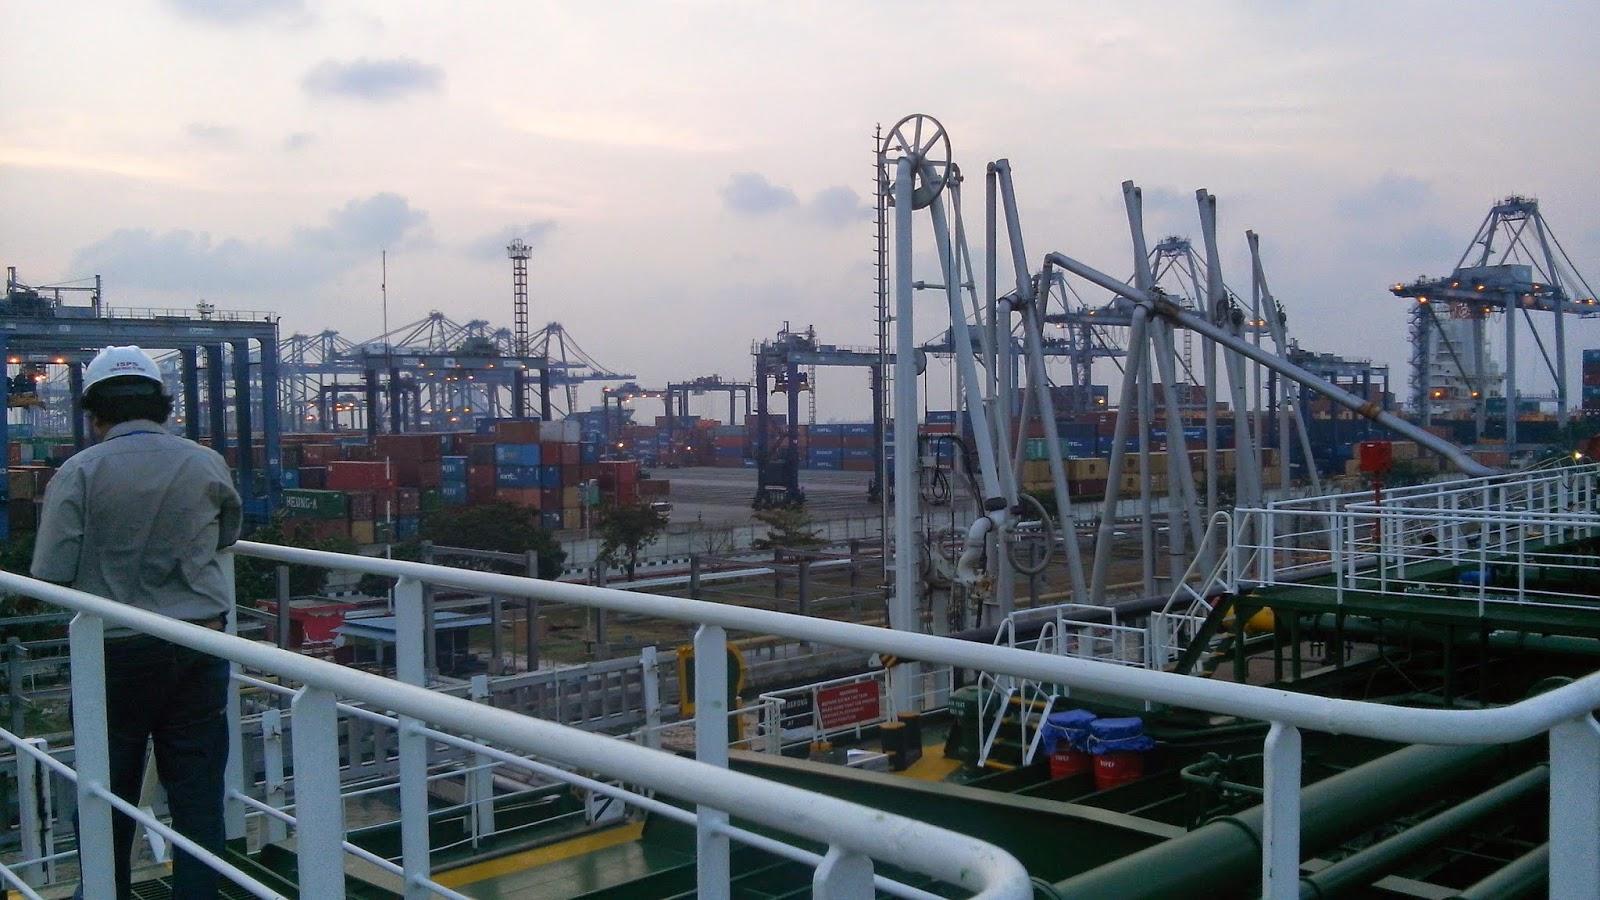 CHECK DAN INSTALASI WOODWARD GOVERNOR TYPE UG-8 KM SUNGAI GERONG, JAKARTA INDONESIA